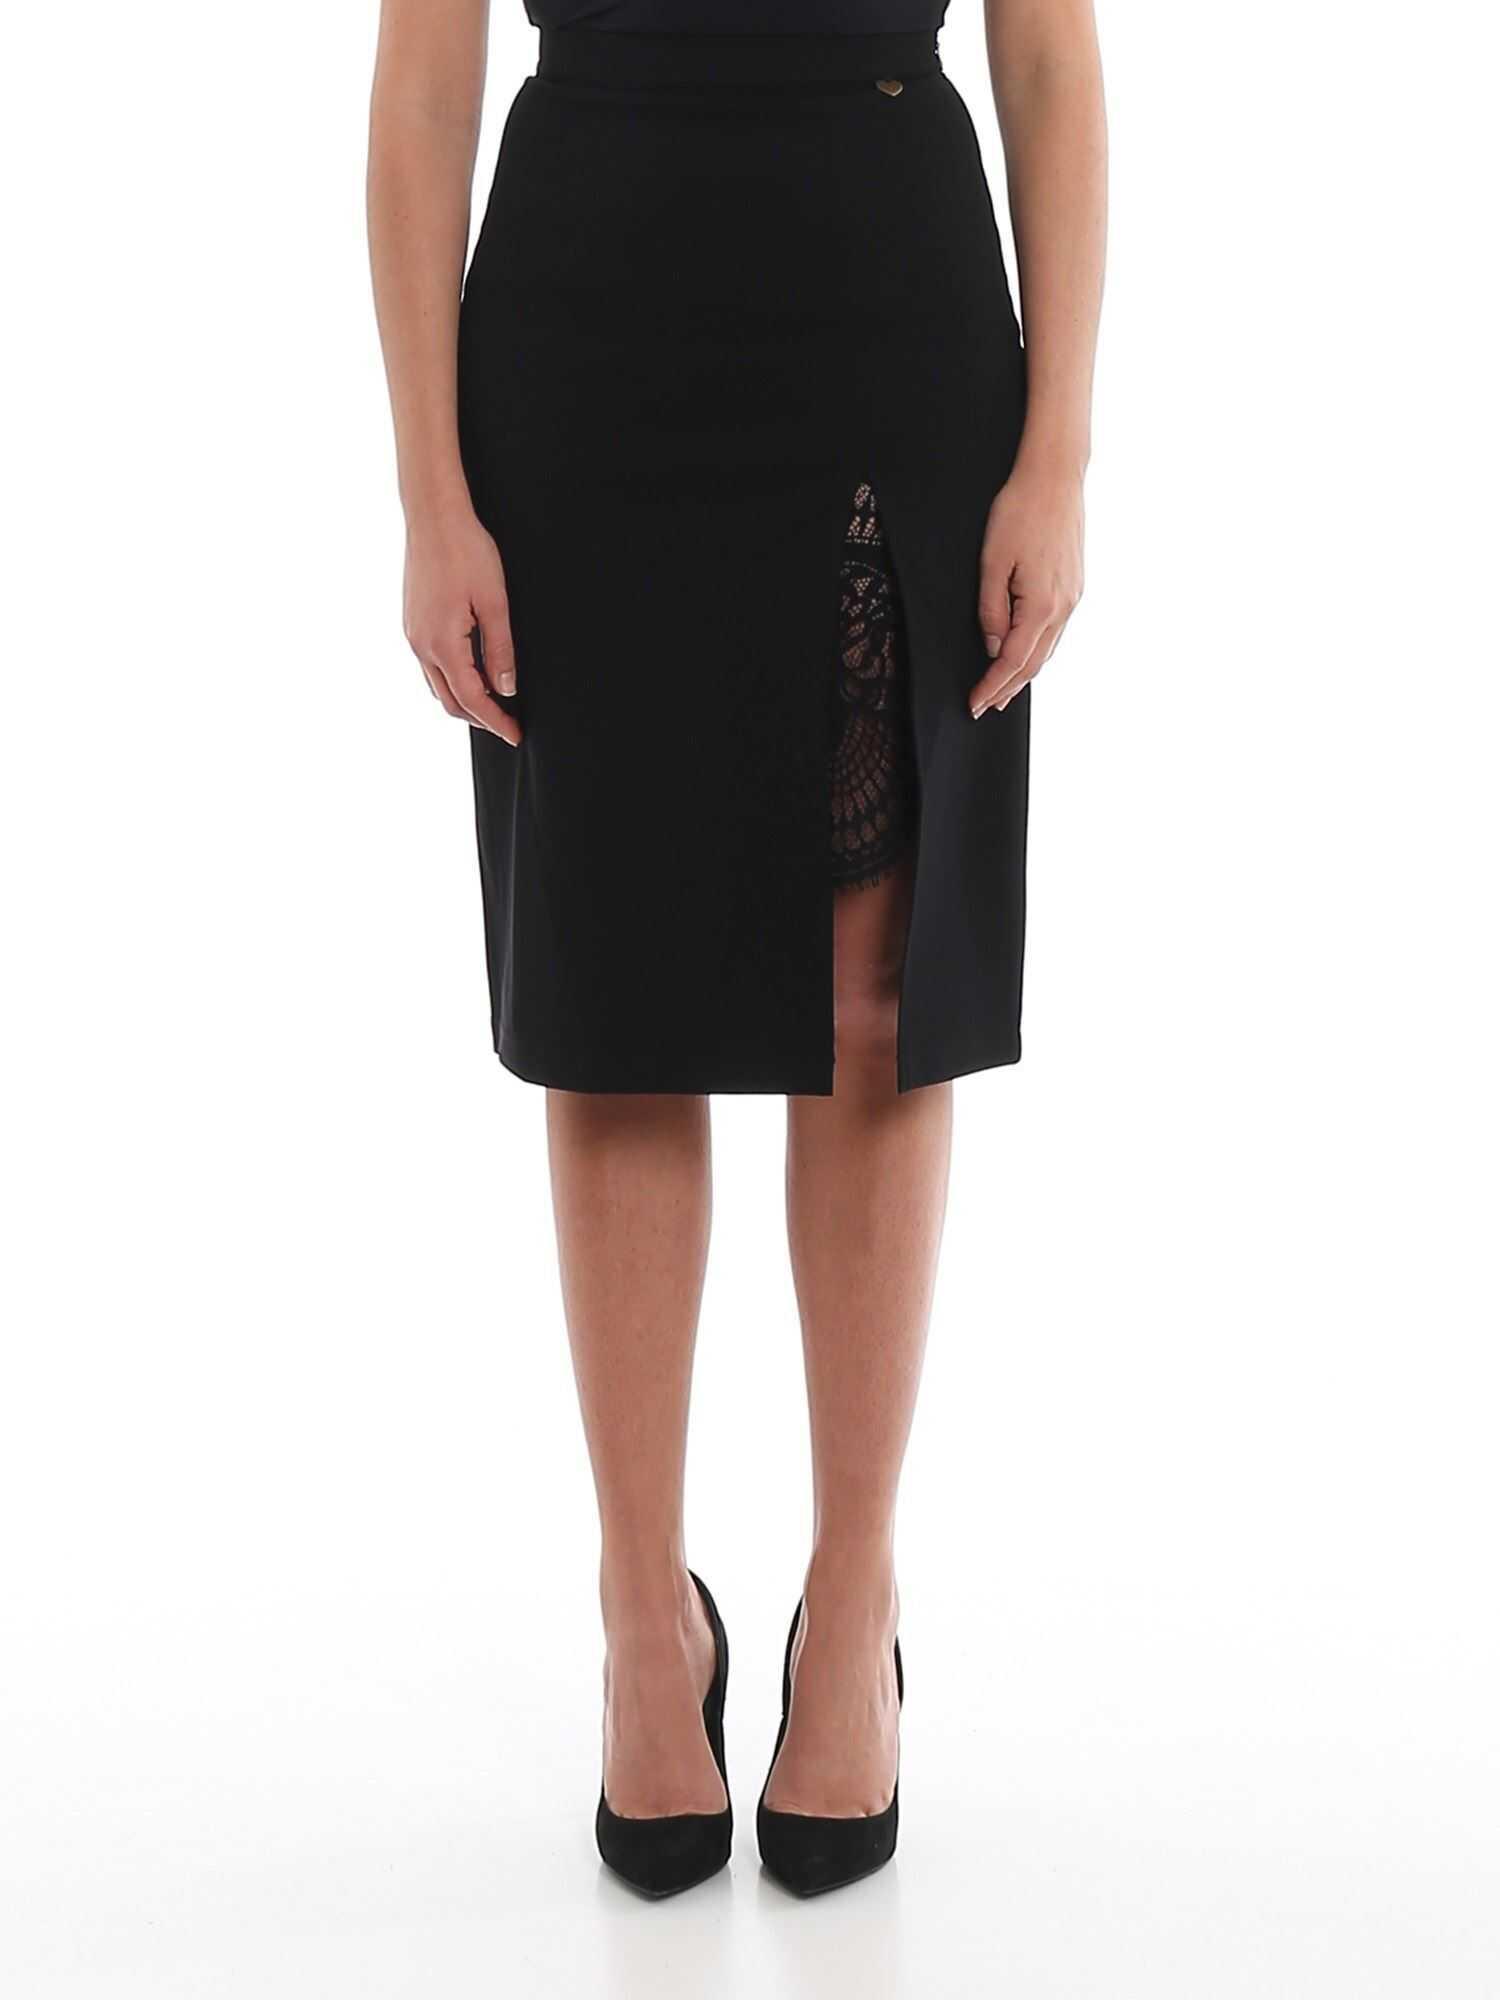 Twin-set Simona Barbieri Lace Detailed Skirt Black